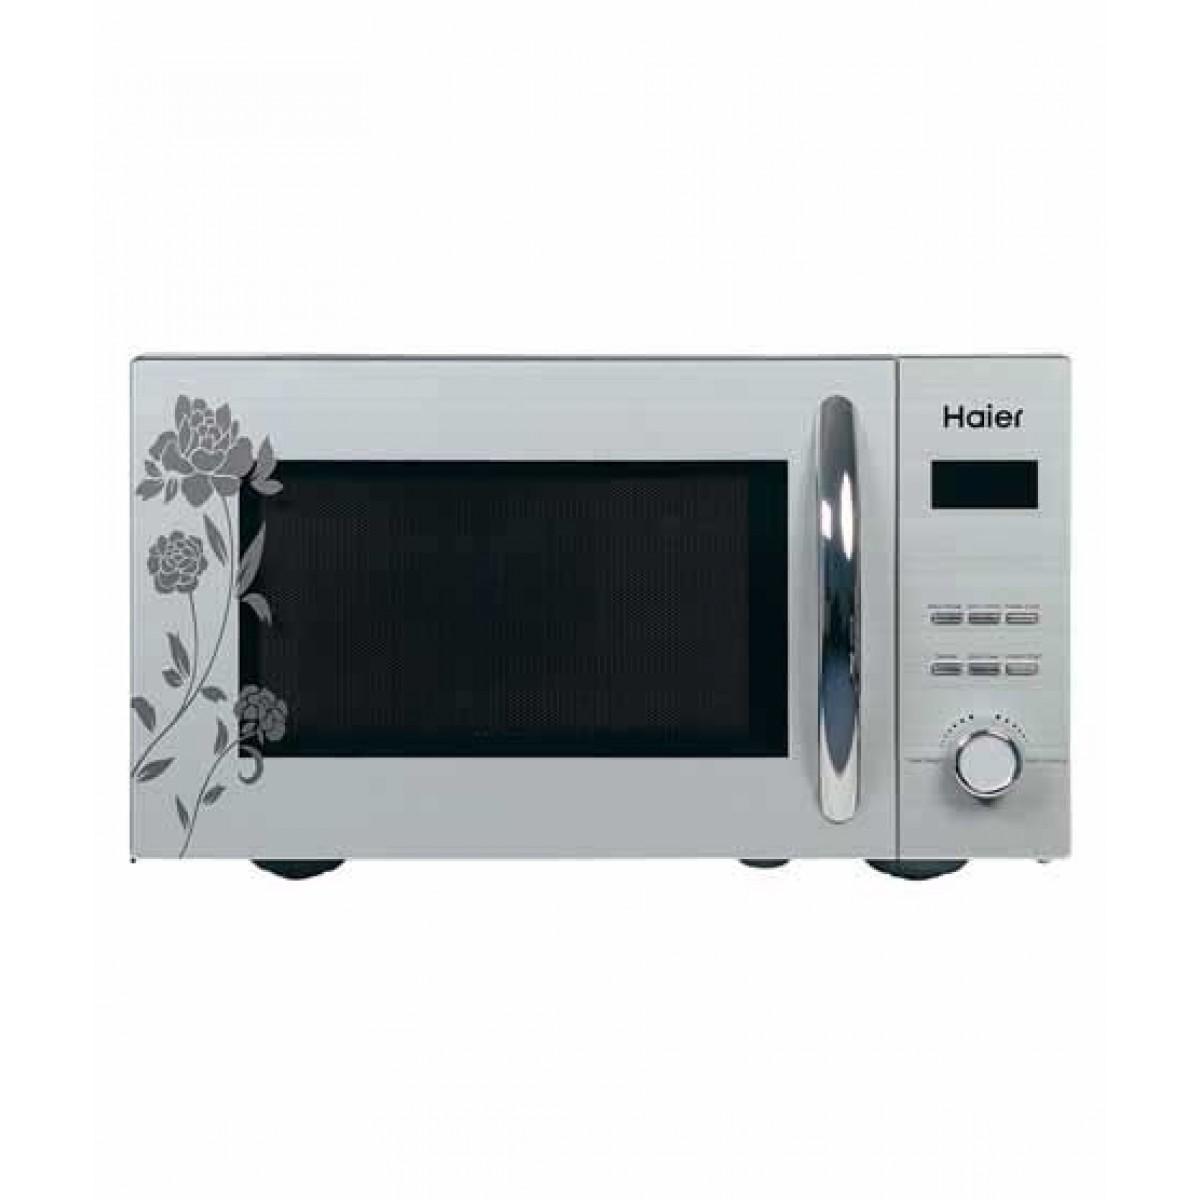 Haier Mirror Series Microwave Oven 23Ltr (HDS-2380EG)